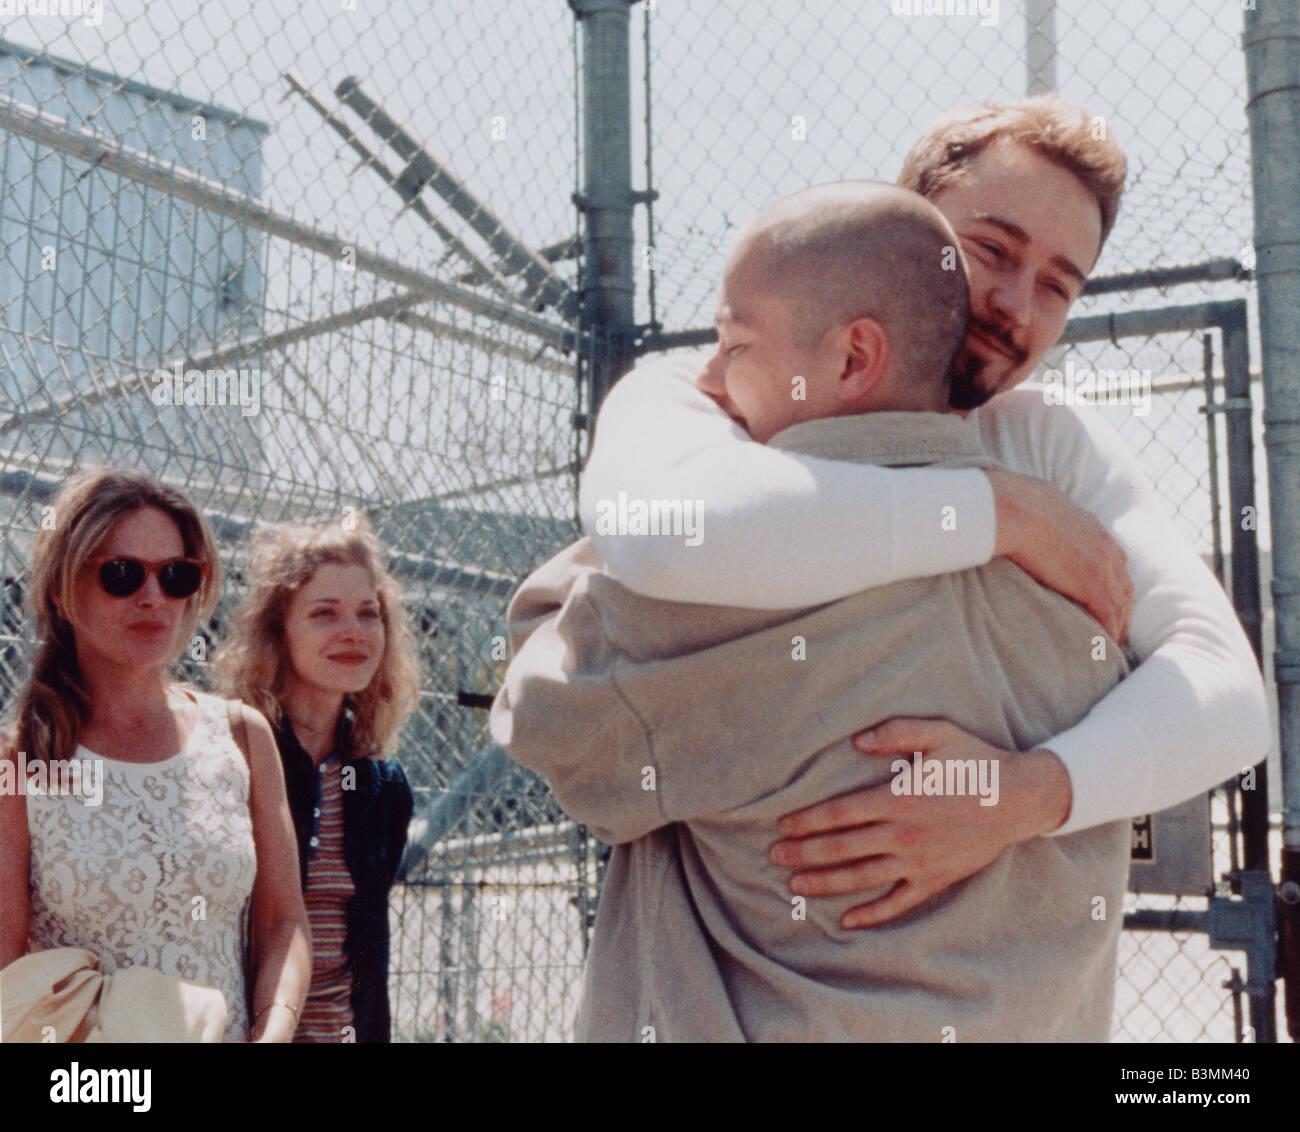 Unterhaltung/New Line Film AMERICAN HISTORY X 1998 Stockbild